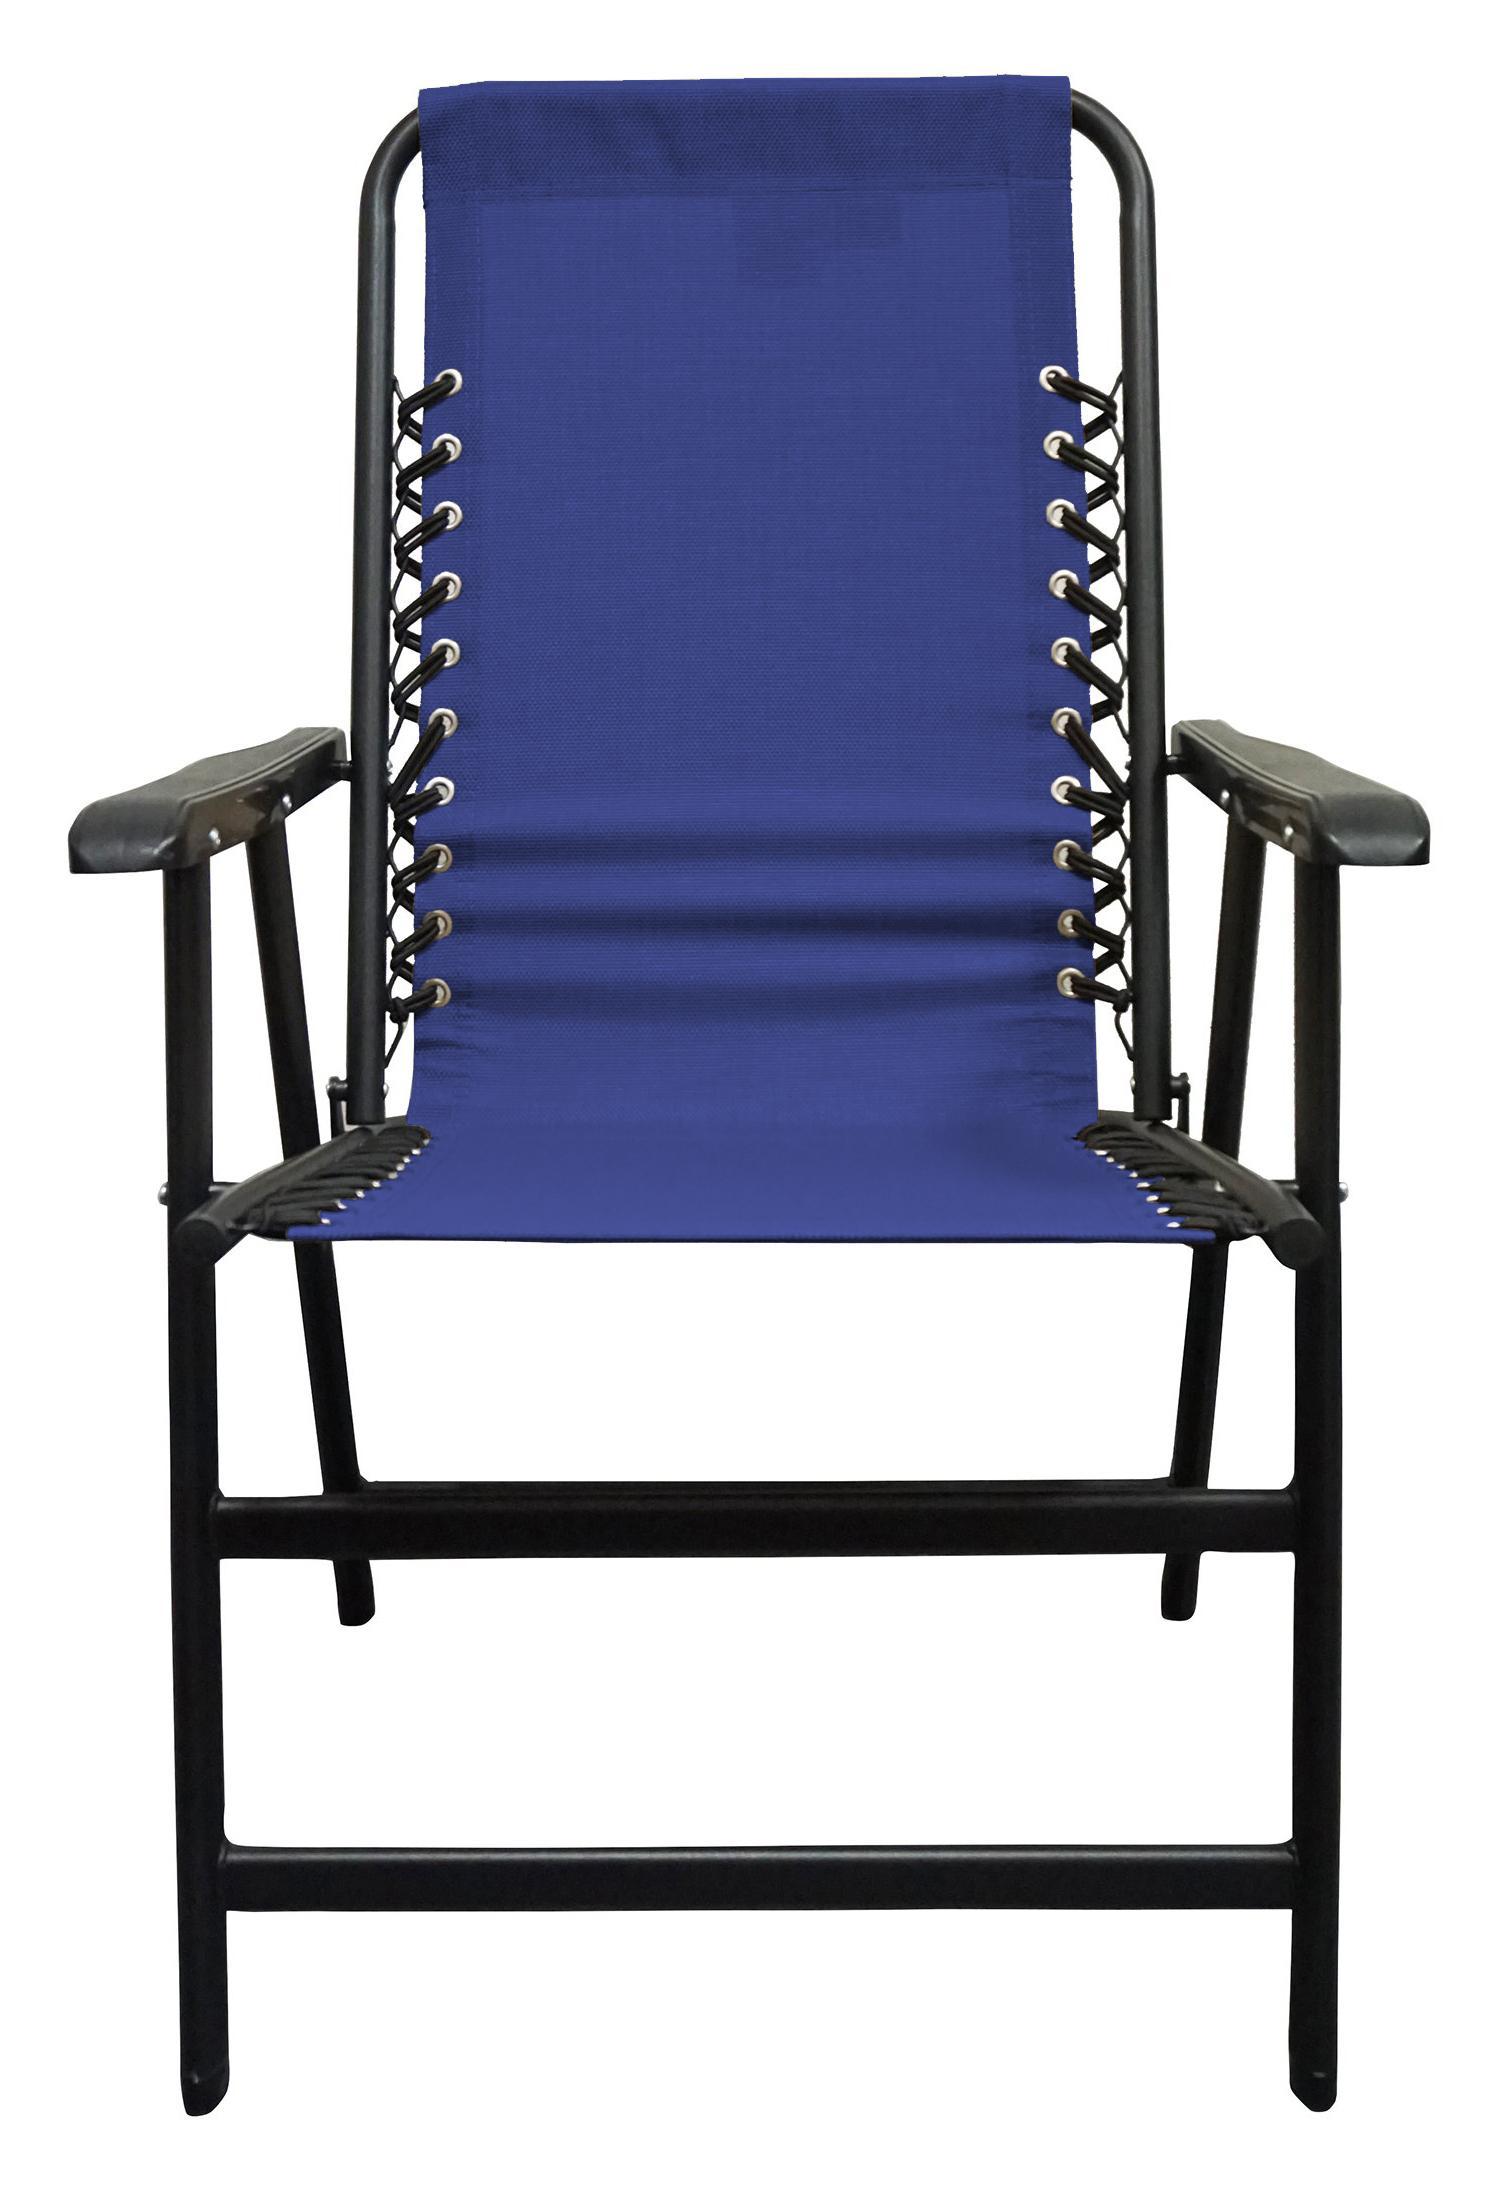 Caravan Sports Suspension Folding Chair Blue Amazon Ca